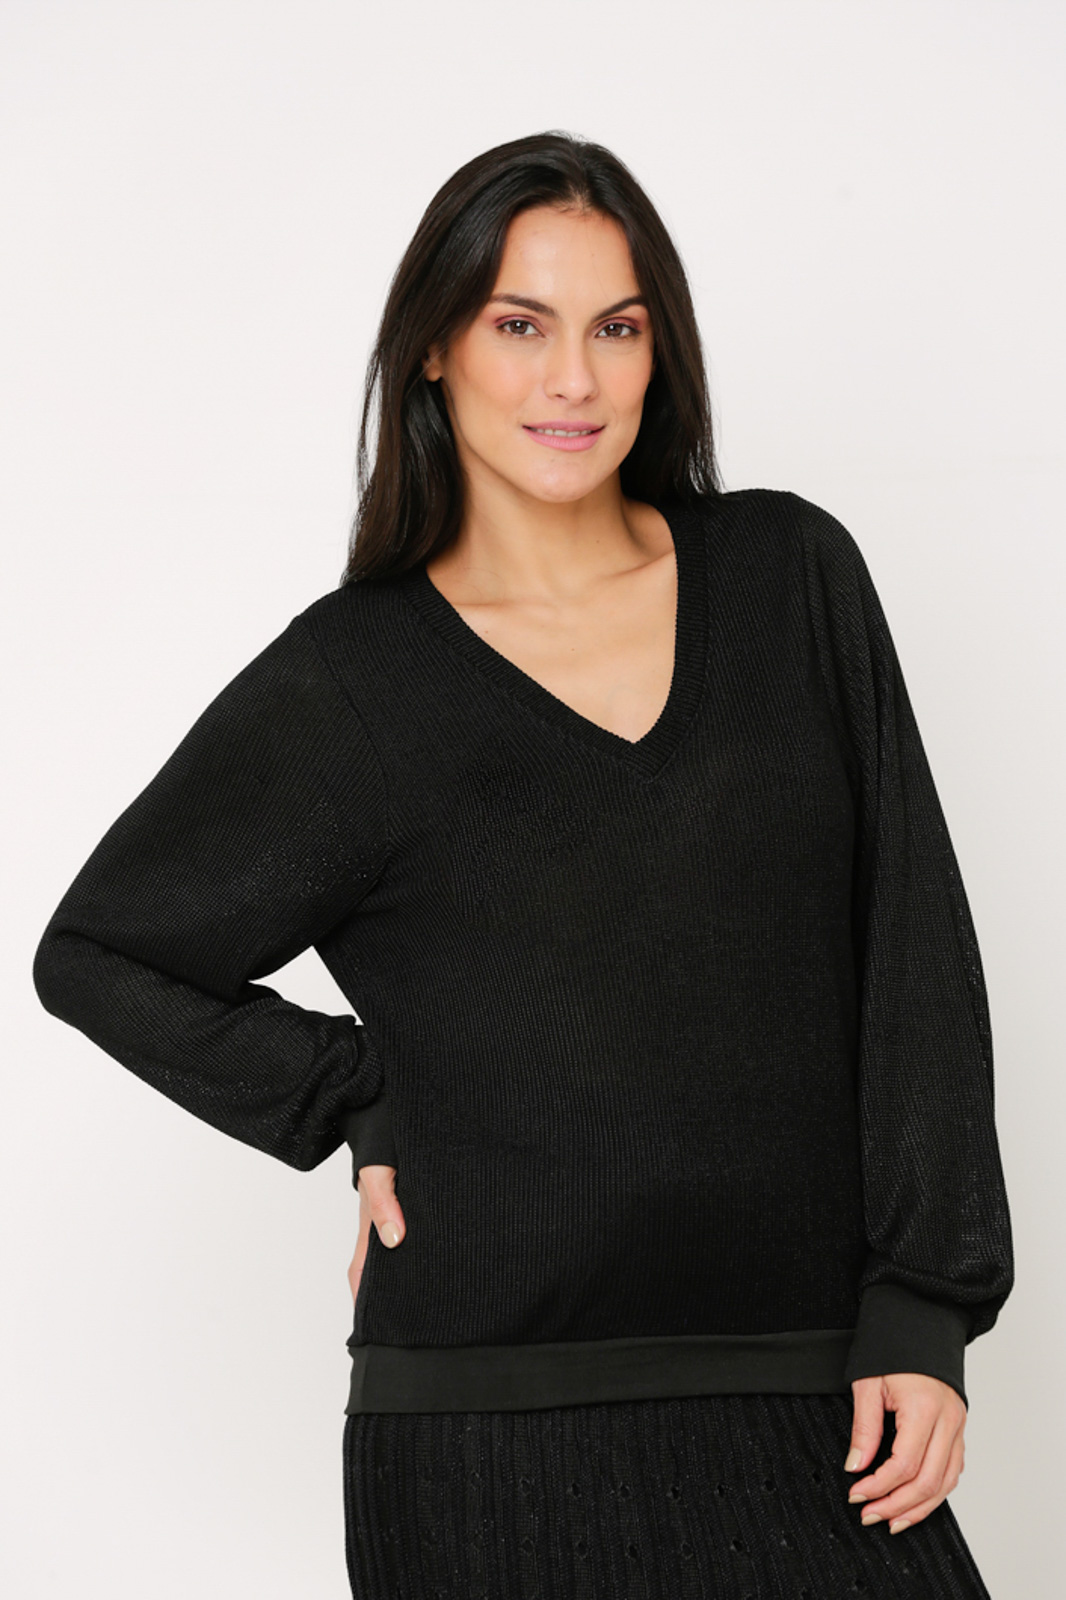 Blusa Ralm tricot ampla decote V manga fofa